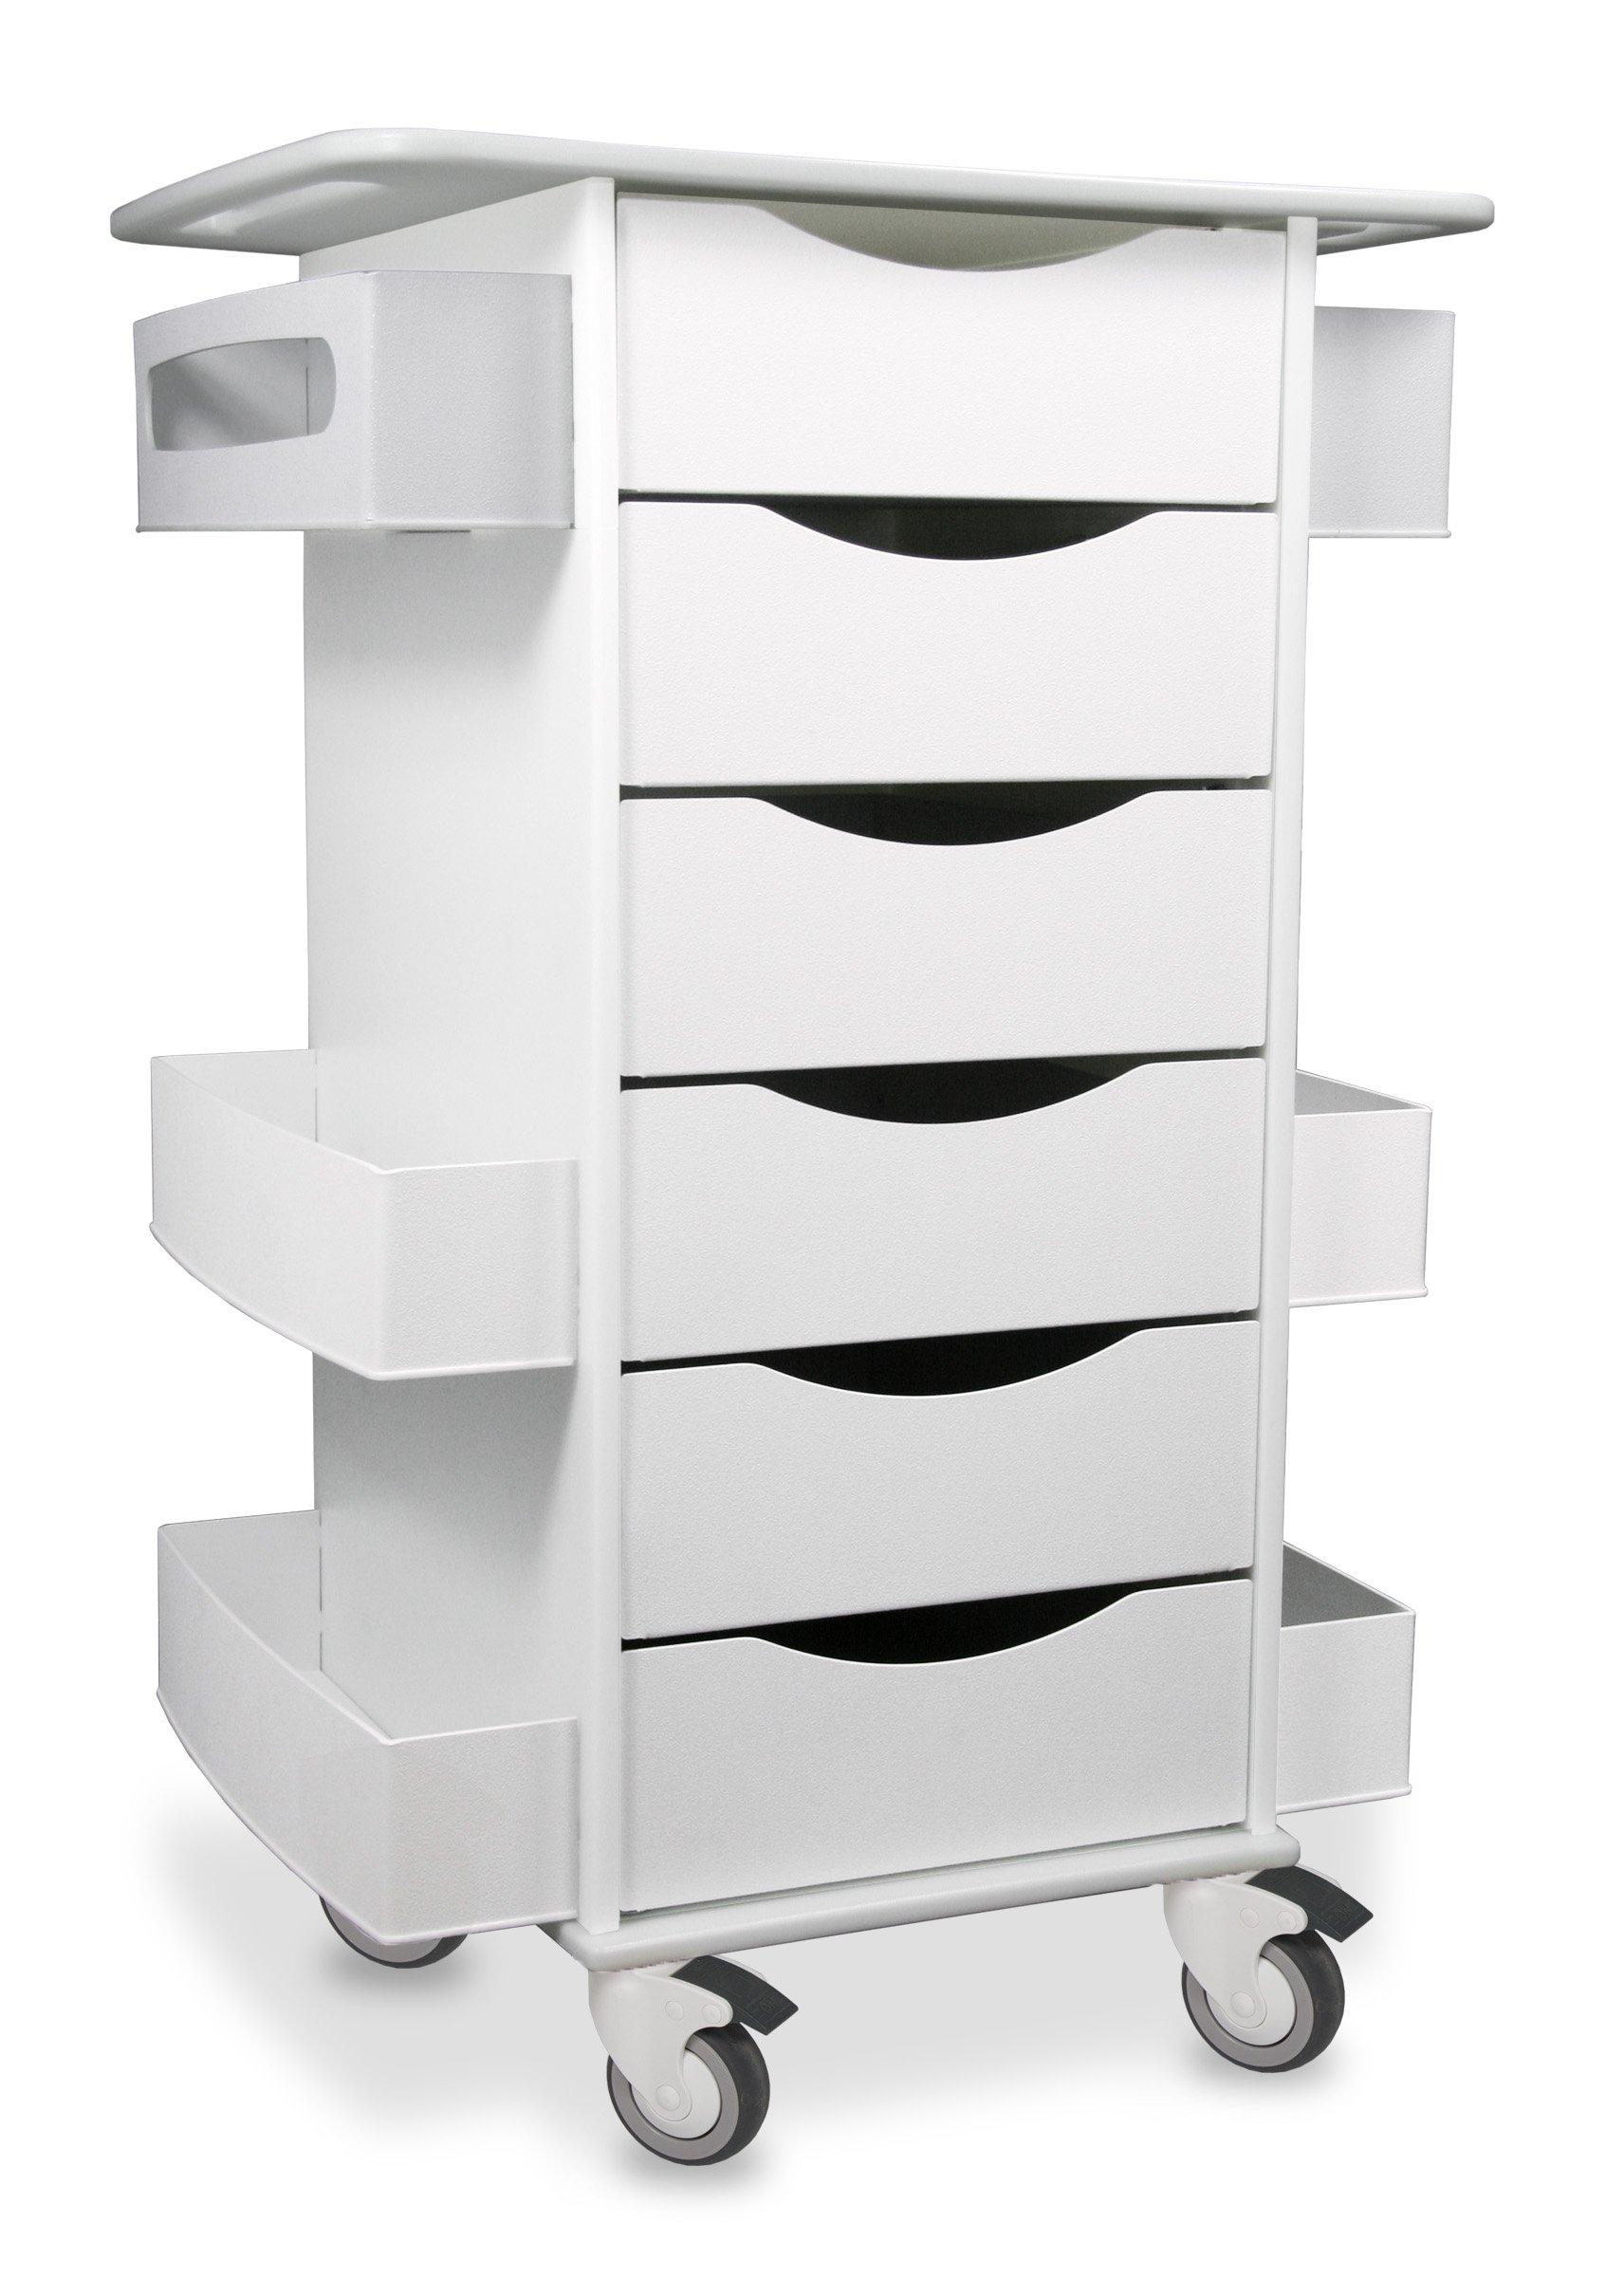 TrippNT 51351 Core Six Drawer Cart, 23'' Width x 35'' Height x 19'' Depth, White